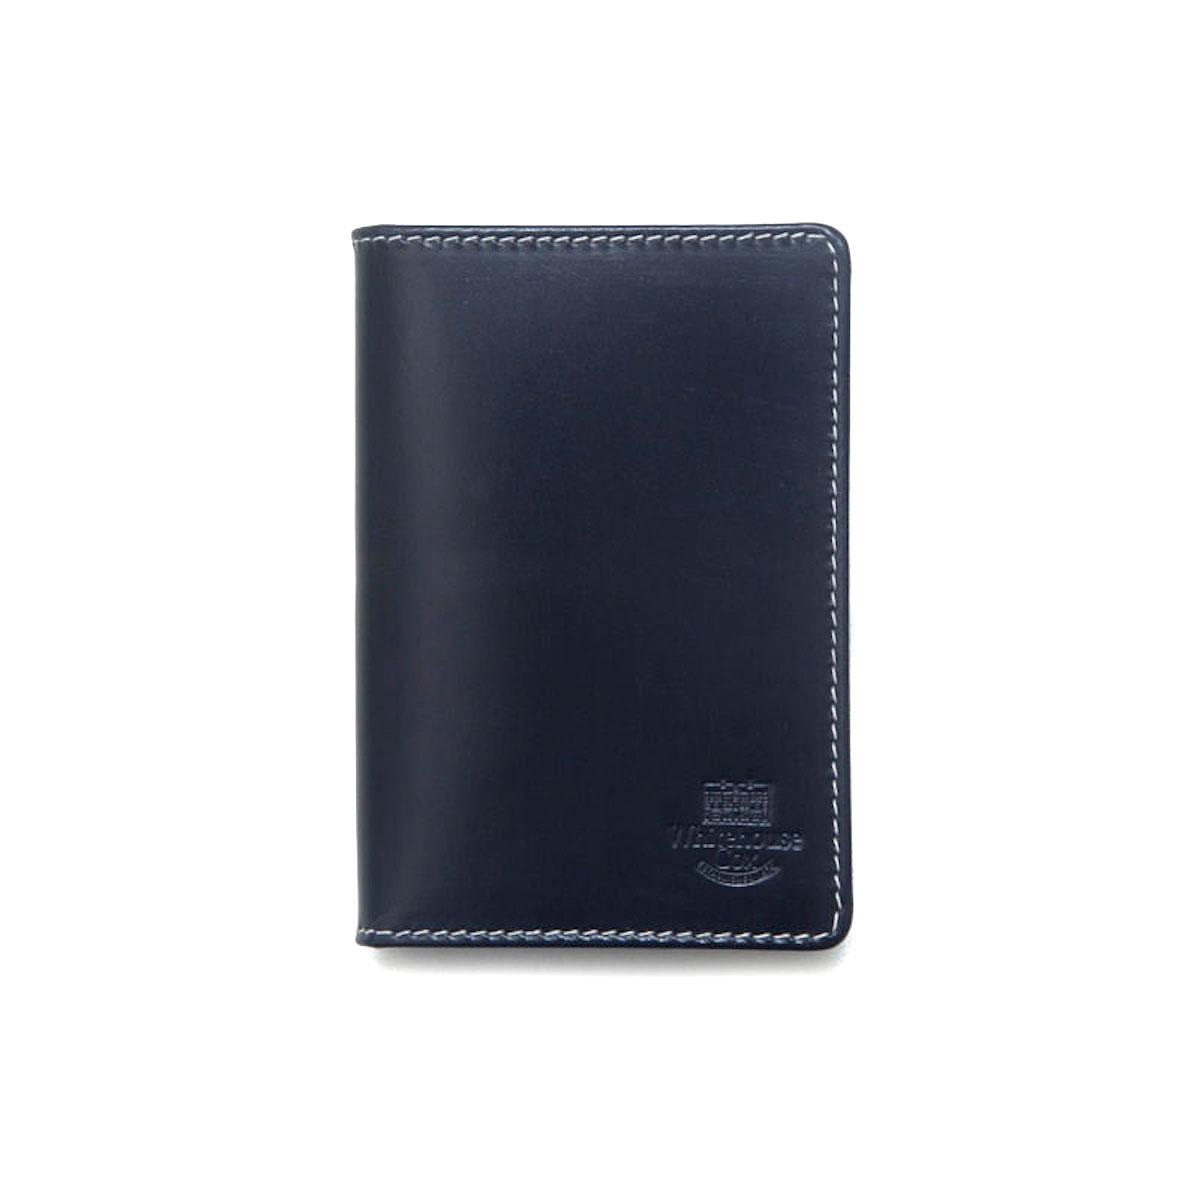 WHITEHOUSE COX / S7412 NAME CARD CASE (Navy×Espresso)